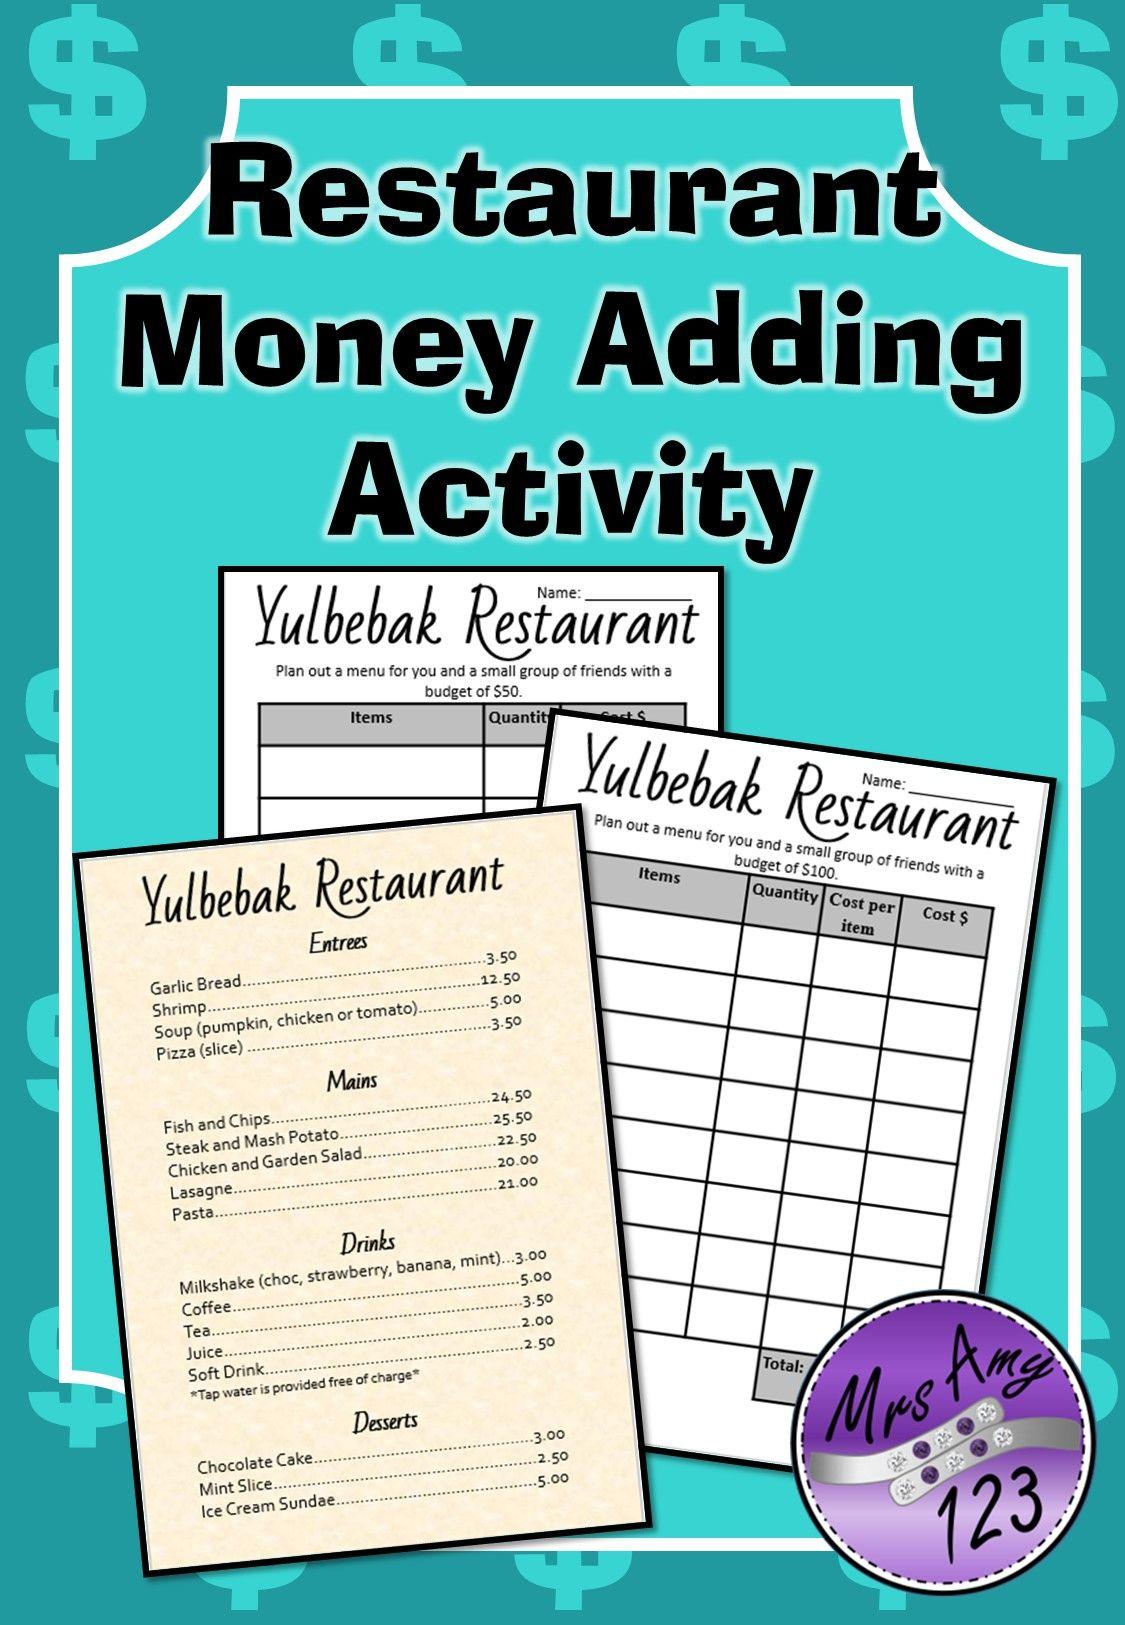 Restaurant Money Adding Activity | Activities, Dbt and Worksheets